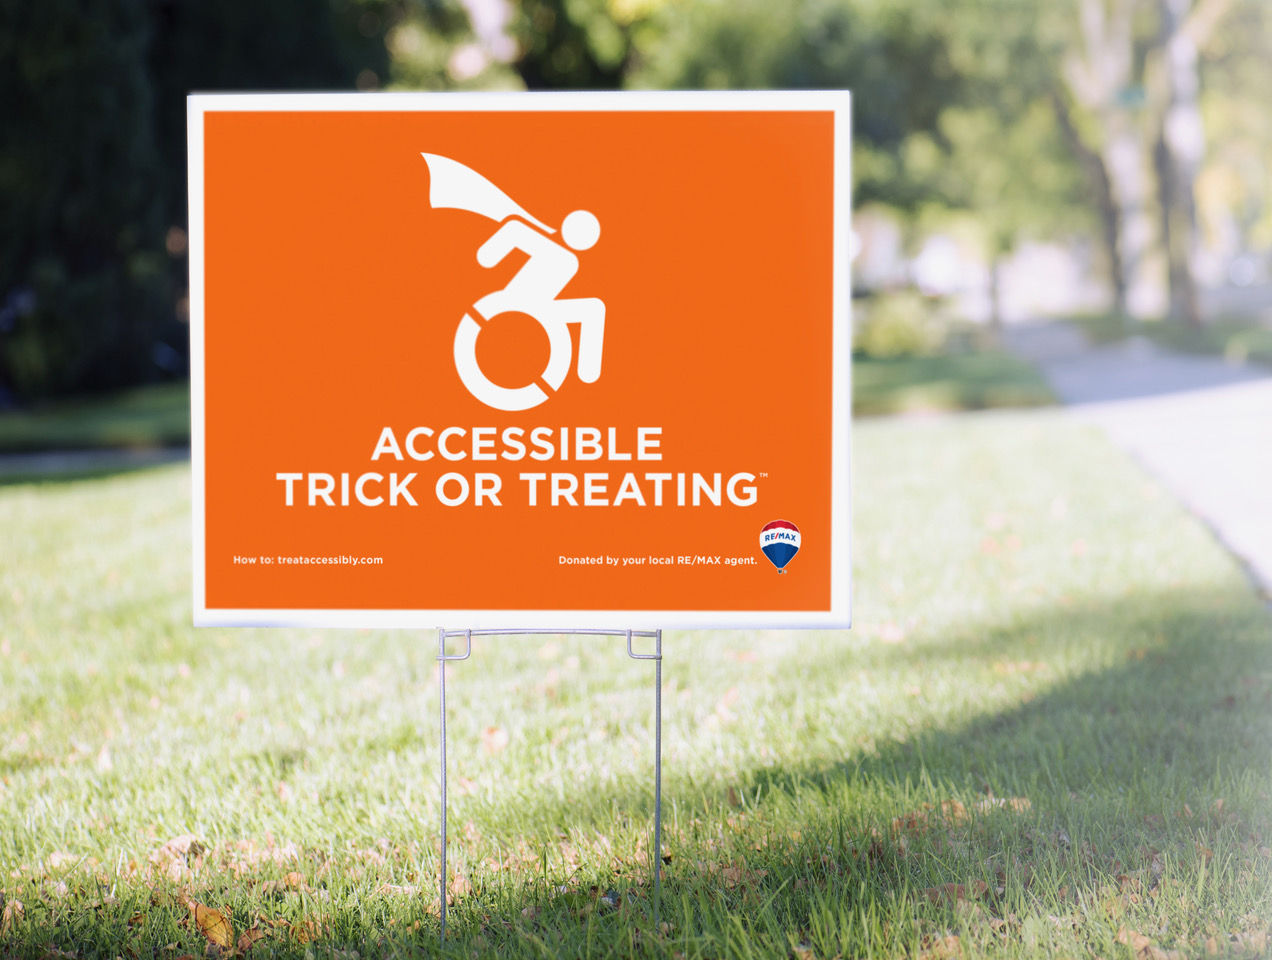 Treat Accessibly